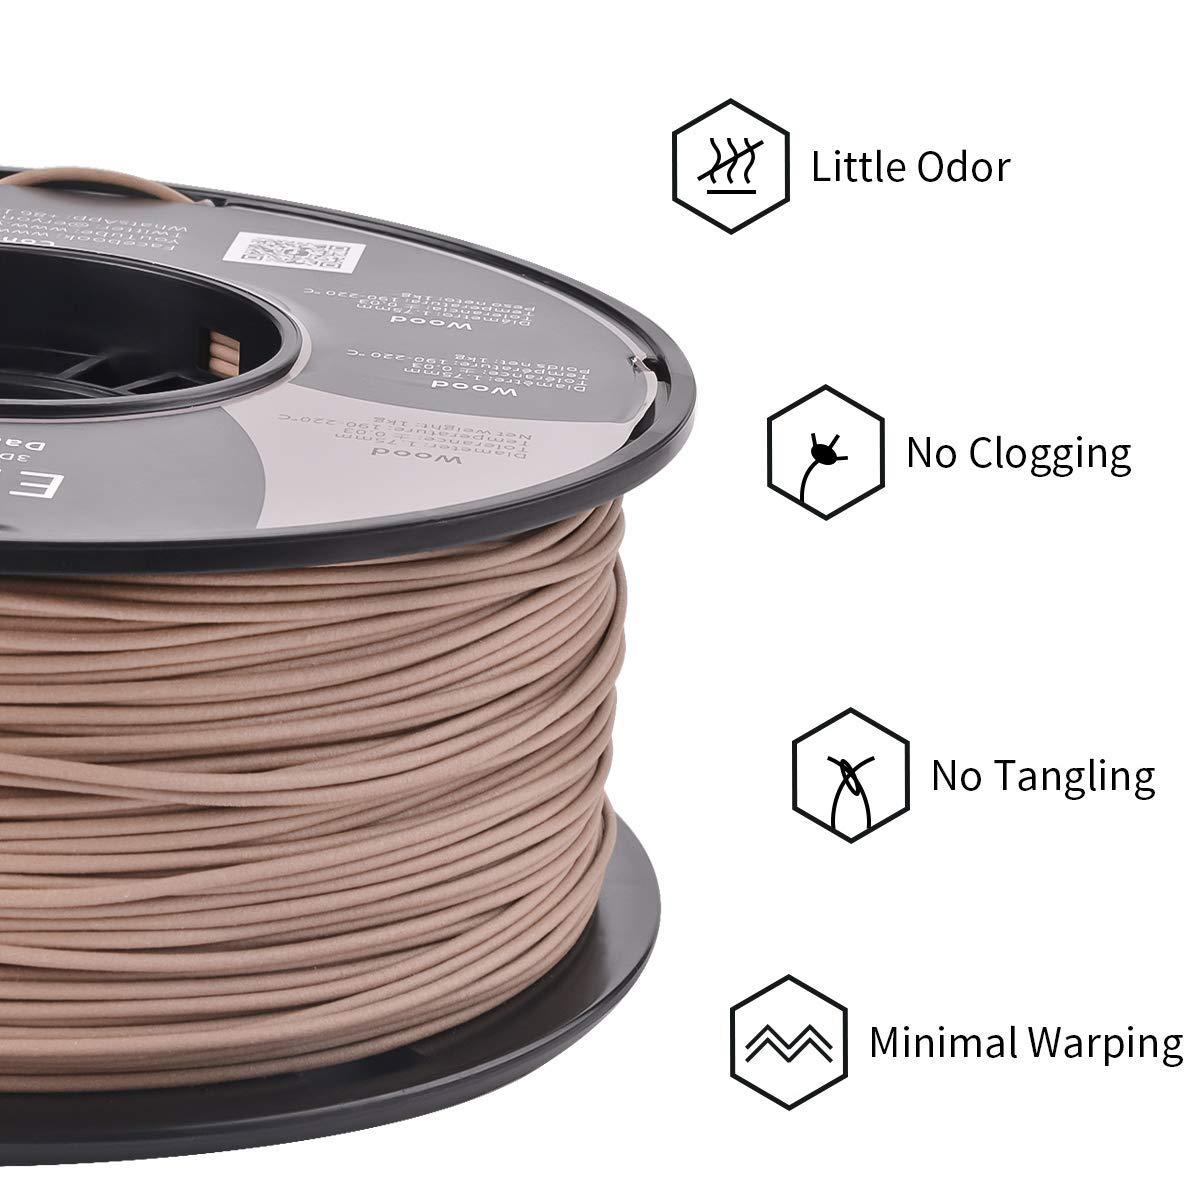 color claro madera Filamento de madera ERYONE PLA 1.75 mm para impresora 3D o bol/ígrafo 1 kg en embalaje al vac/ío